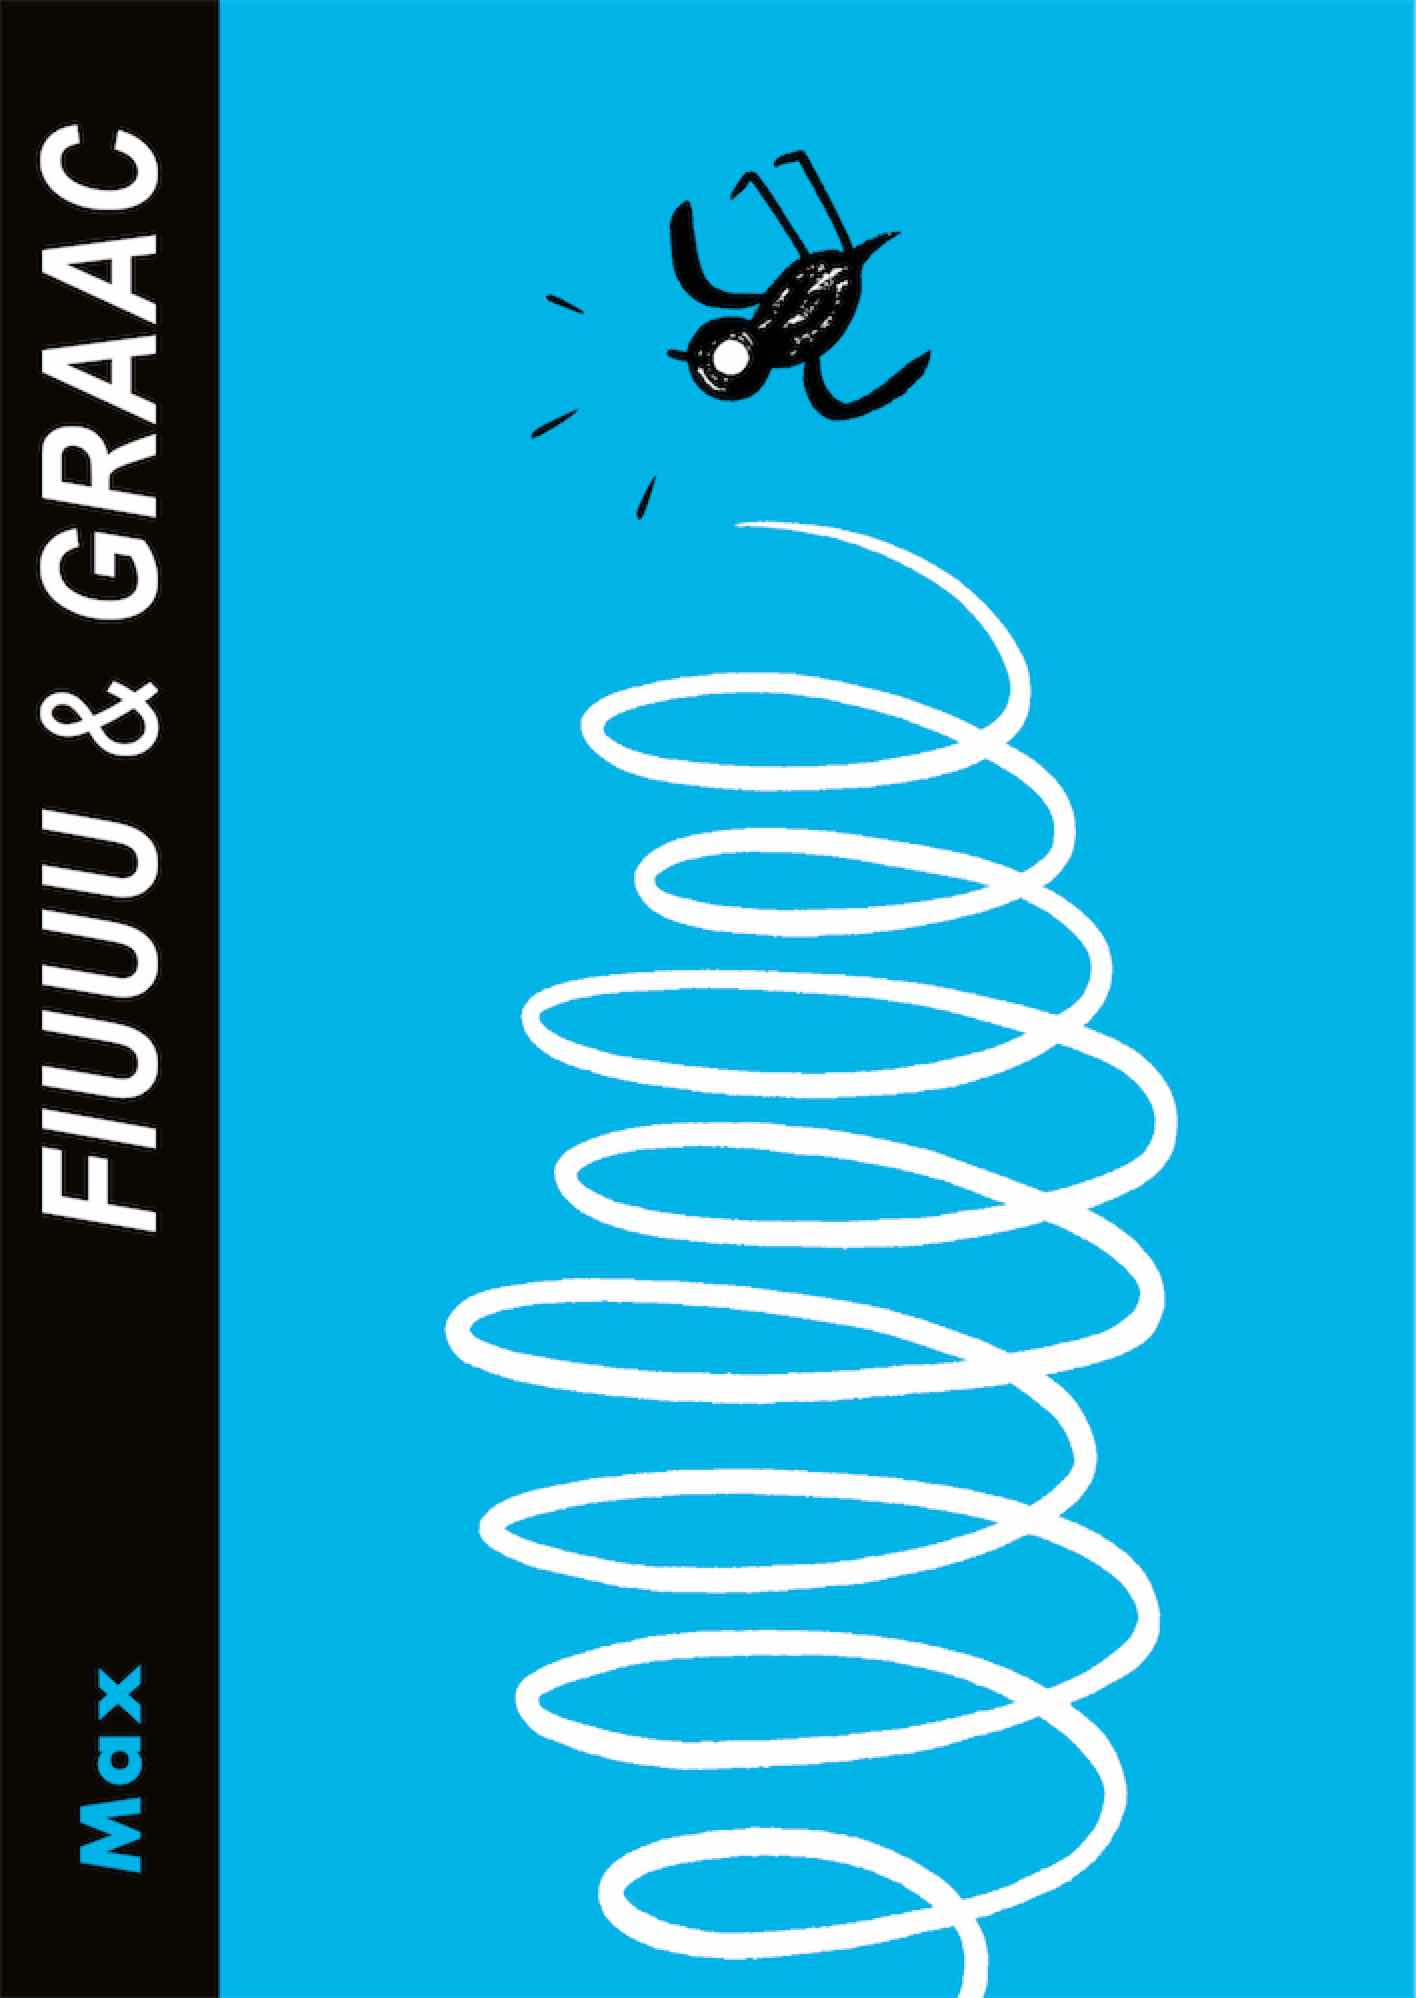 FIUUU & GRAAC (EDICIO EN CATALA)